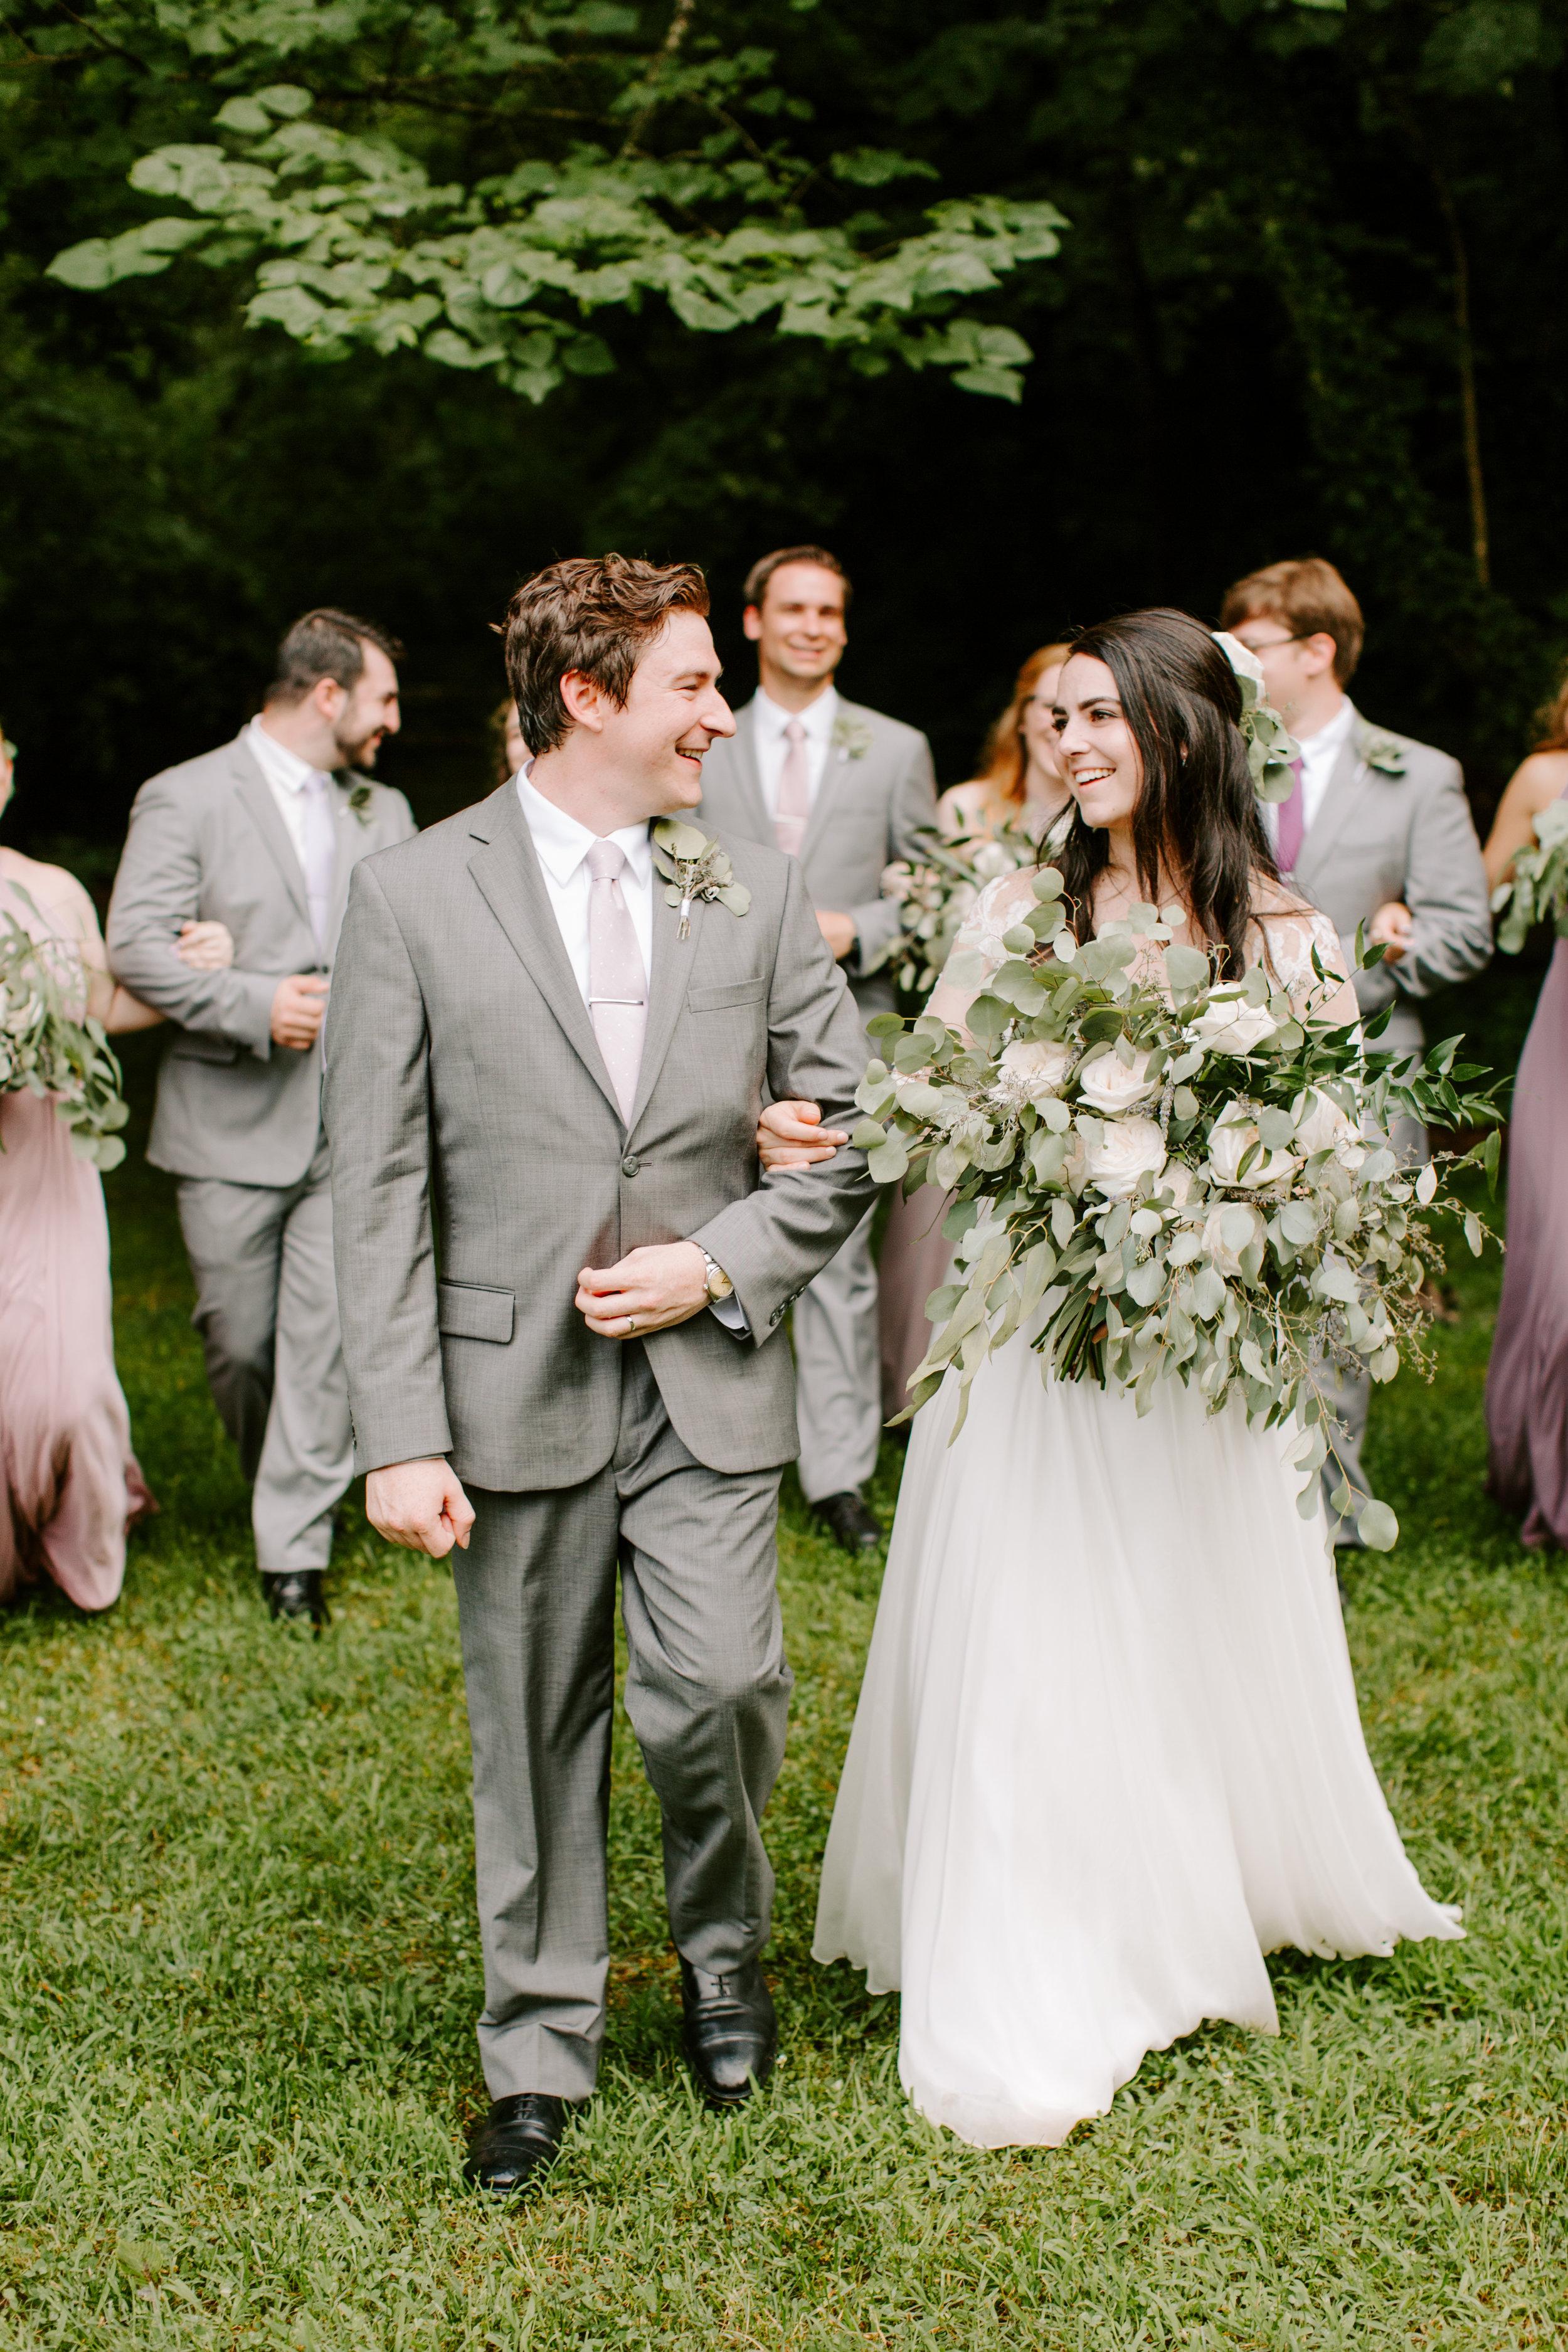 wedding-party-walking.jpg